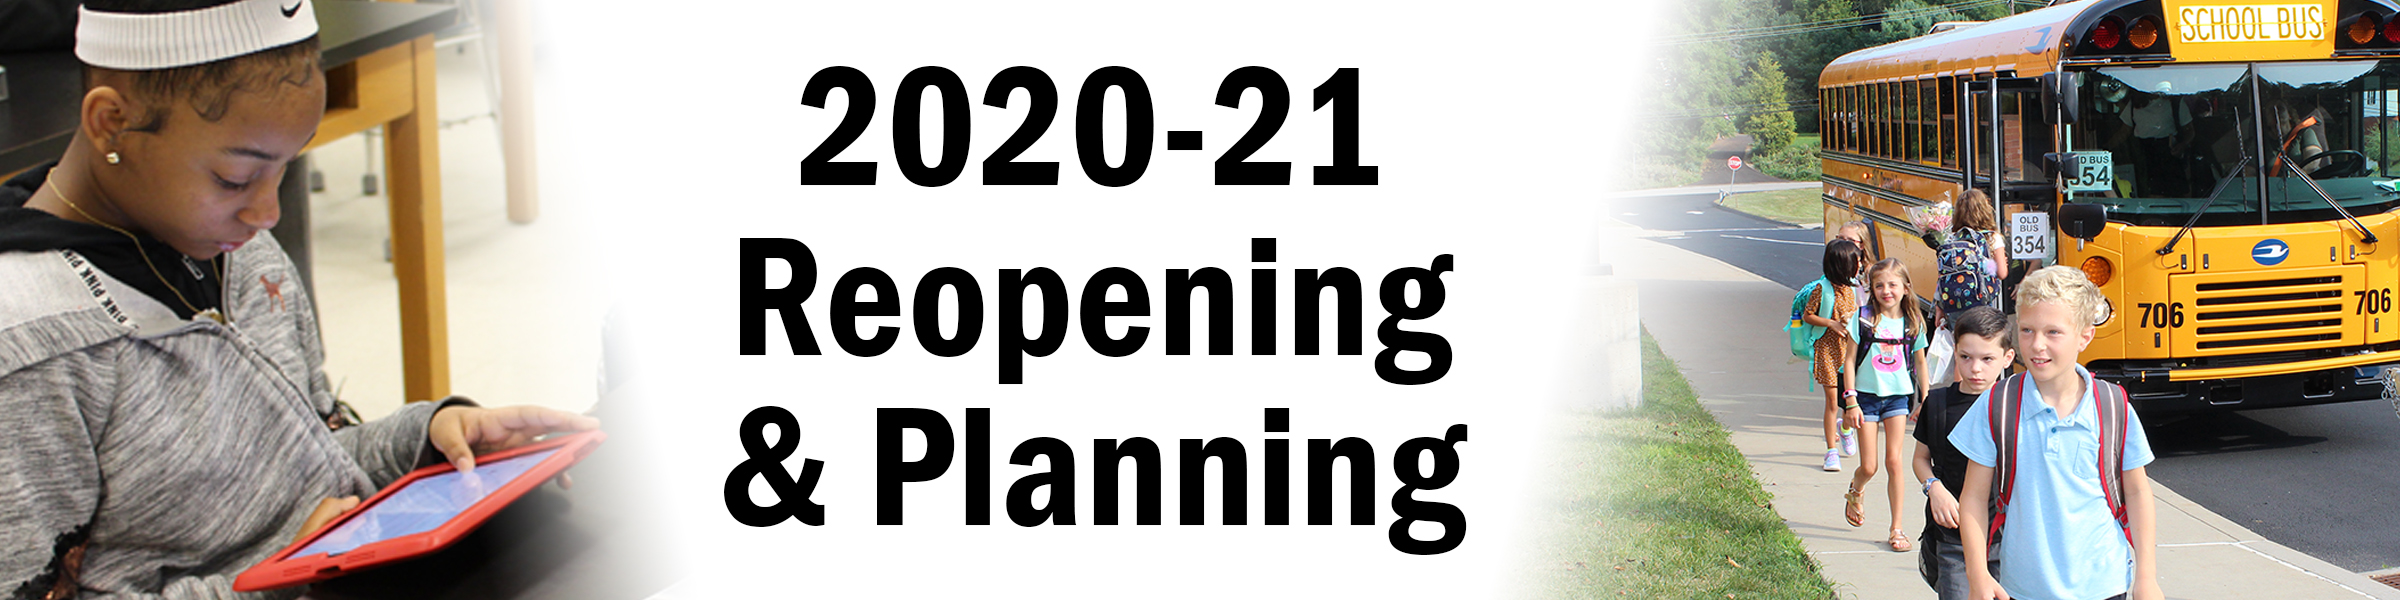 2020-21Planning_bannerv23.jpg